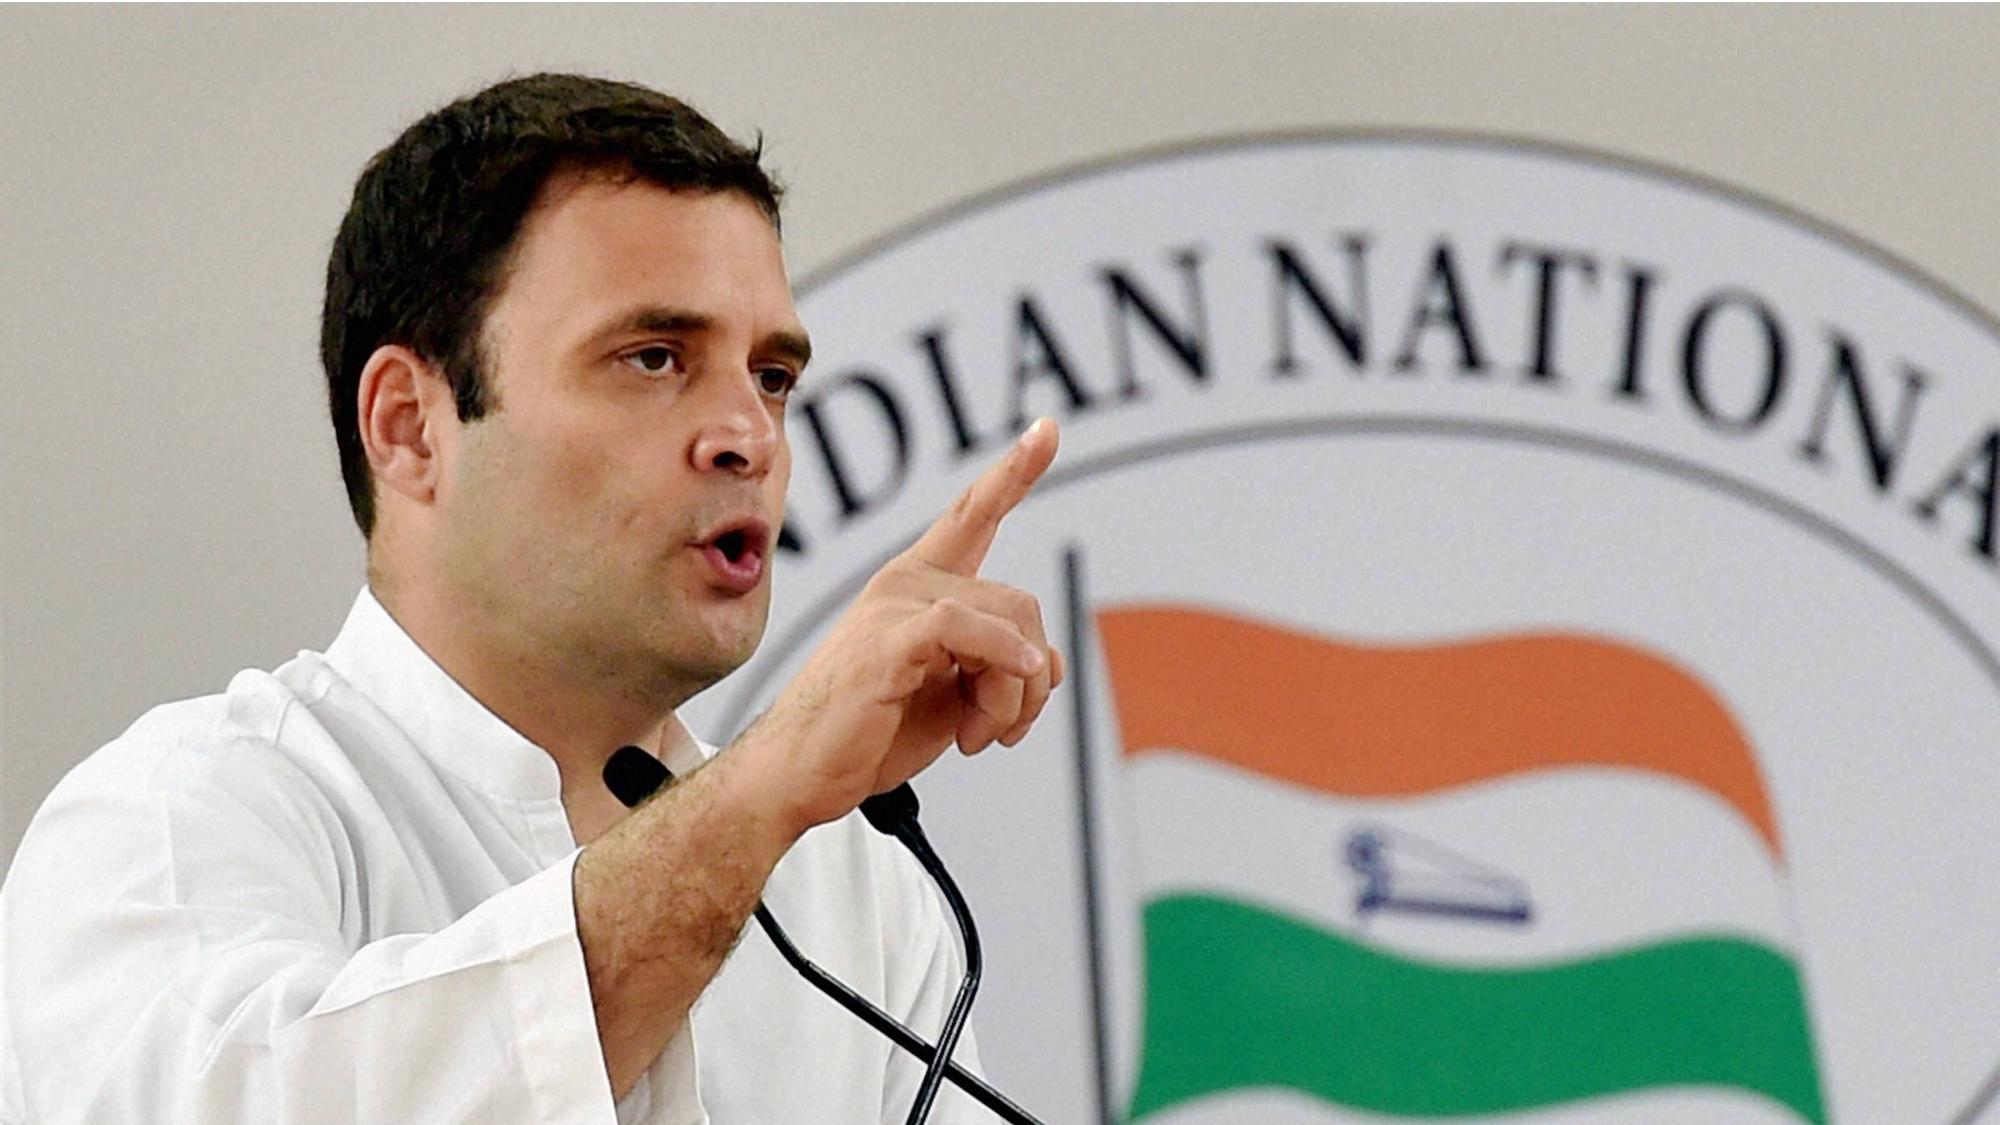 Bihar Deputy CM Drags Rahul Gandhi to Court Over Modi Surname Jibe